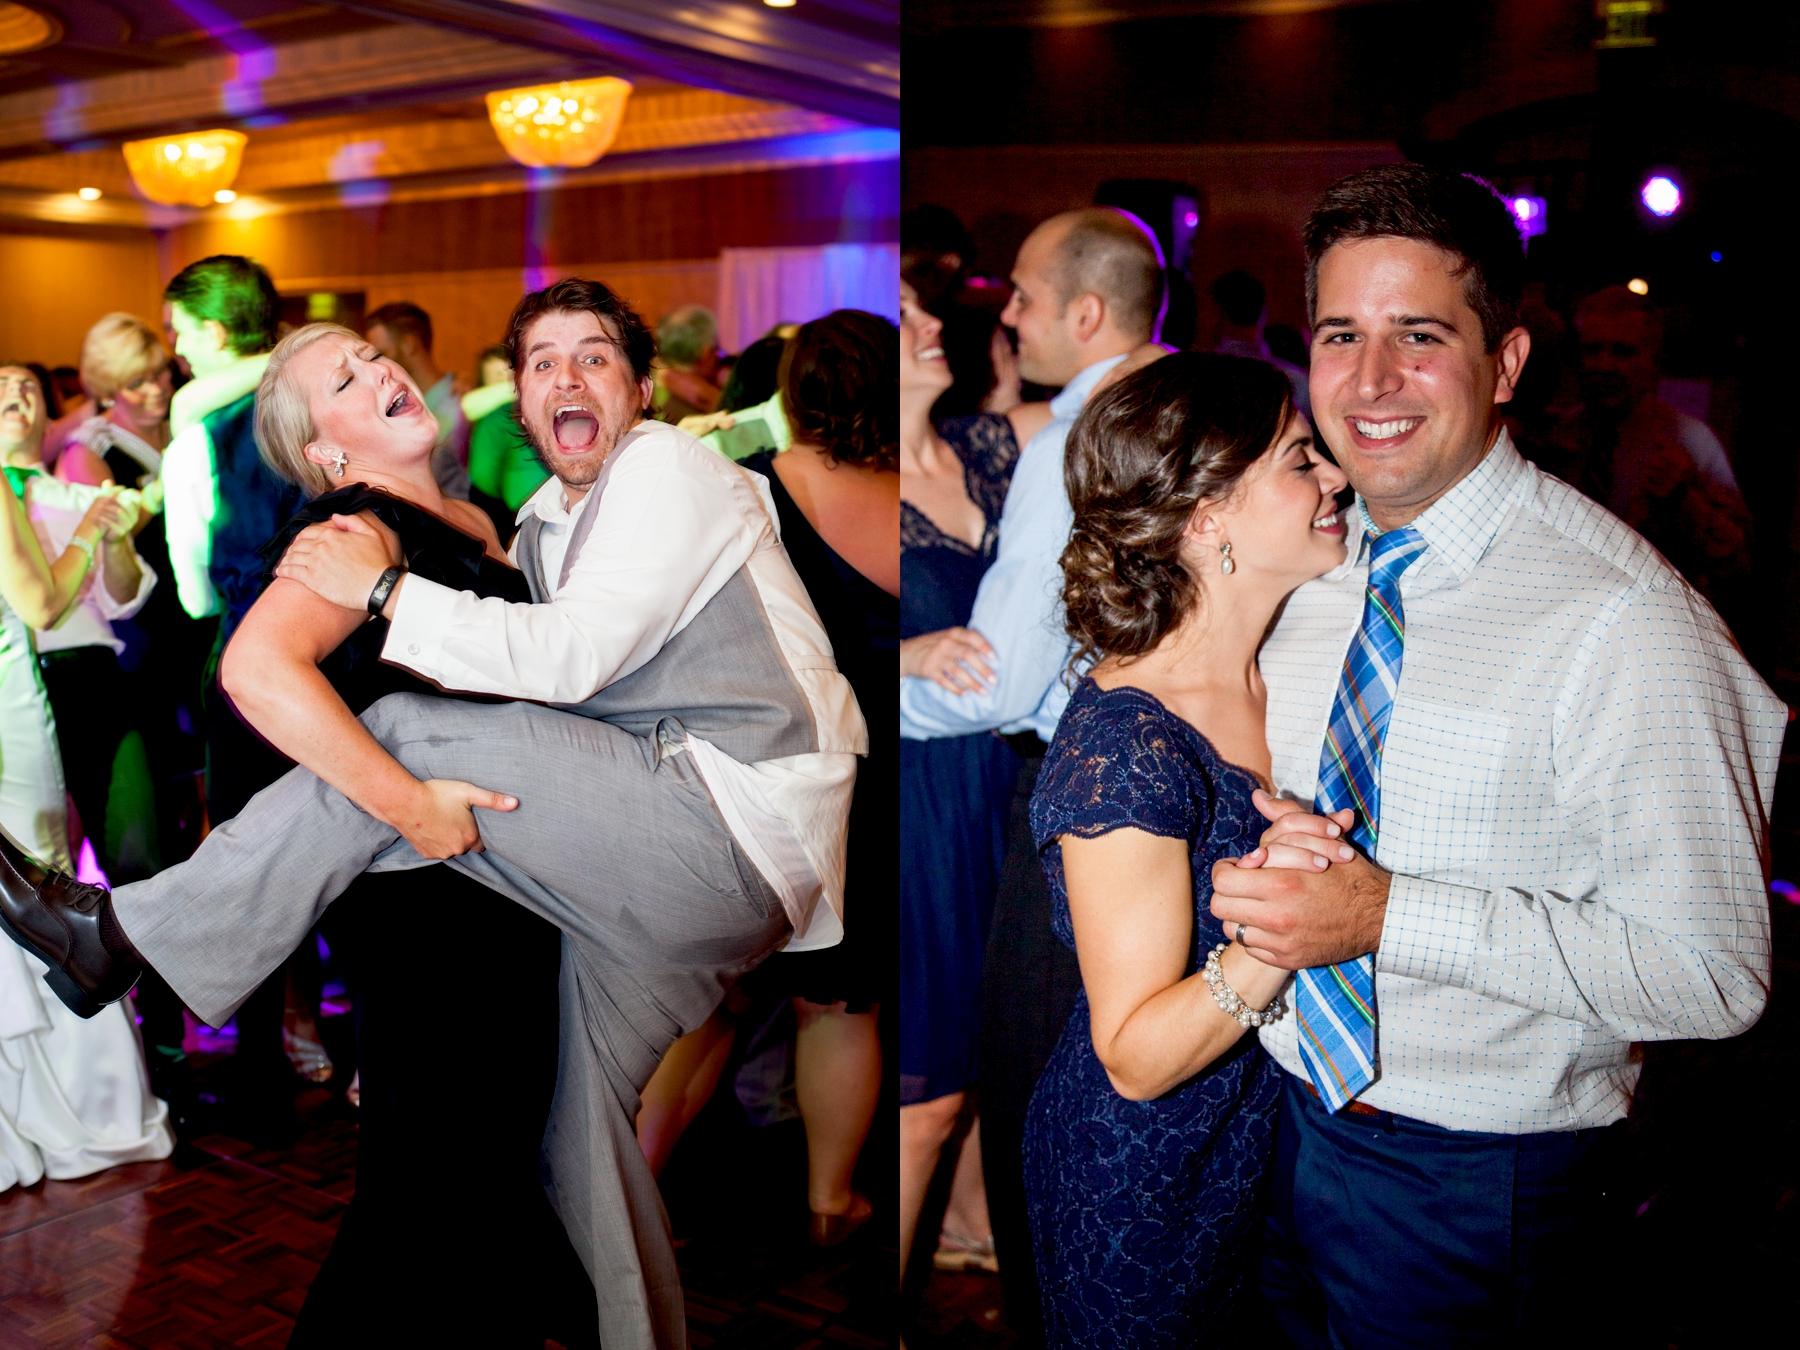 Brandon_Shafer_Photography_Chris_Lauren_Michigan_State_Capital_Wedding_0055.jpg